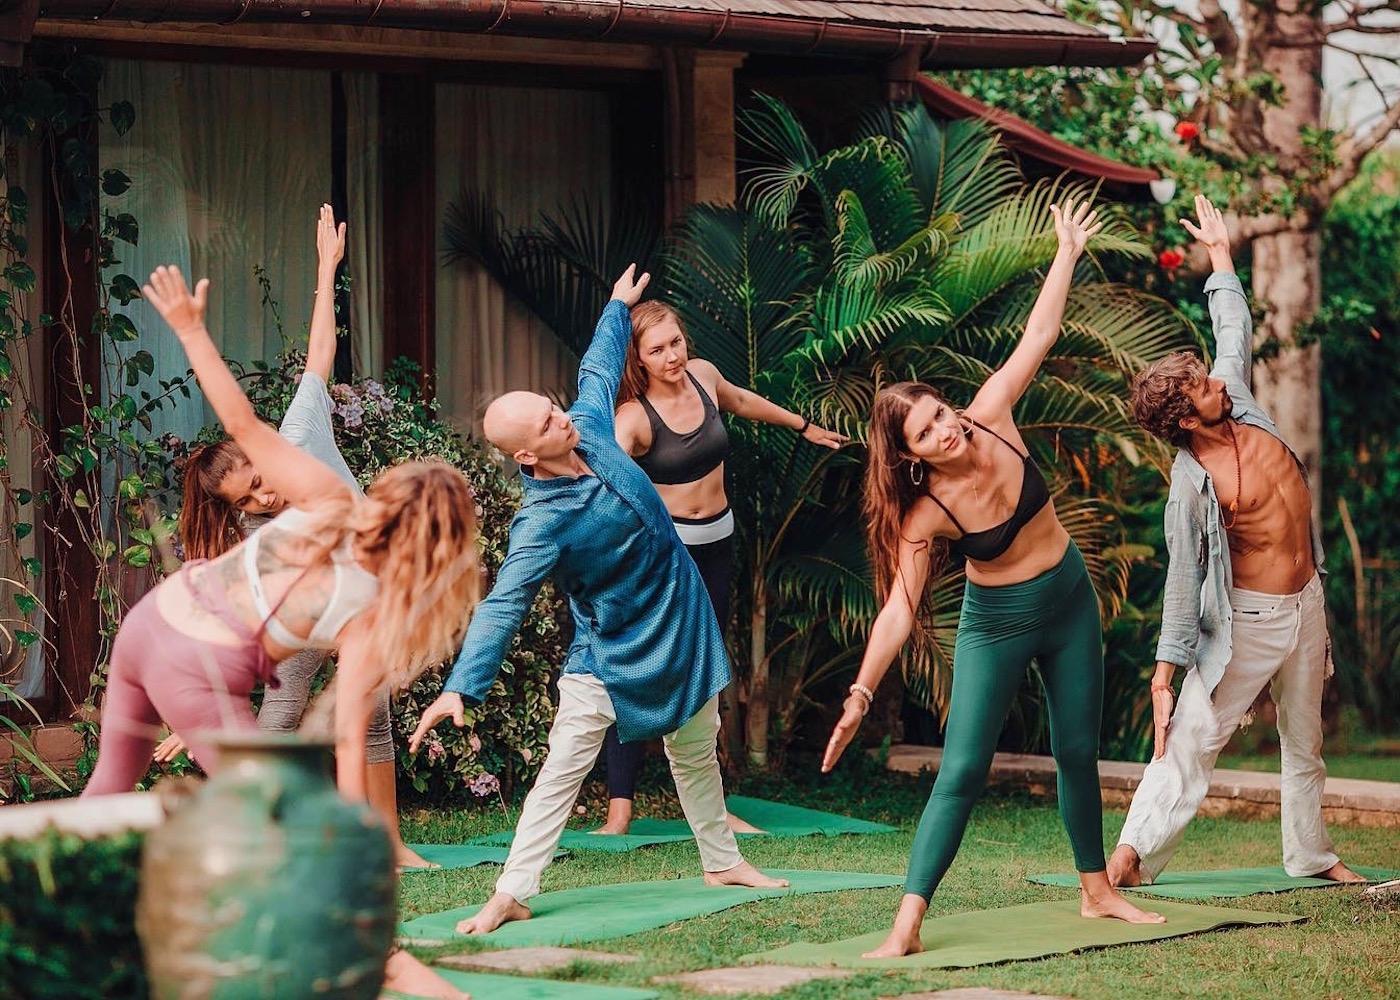 Garden yoga at Tru Love Unity in Umalas, Bali, Indonesia